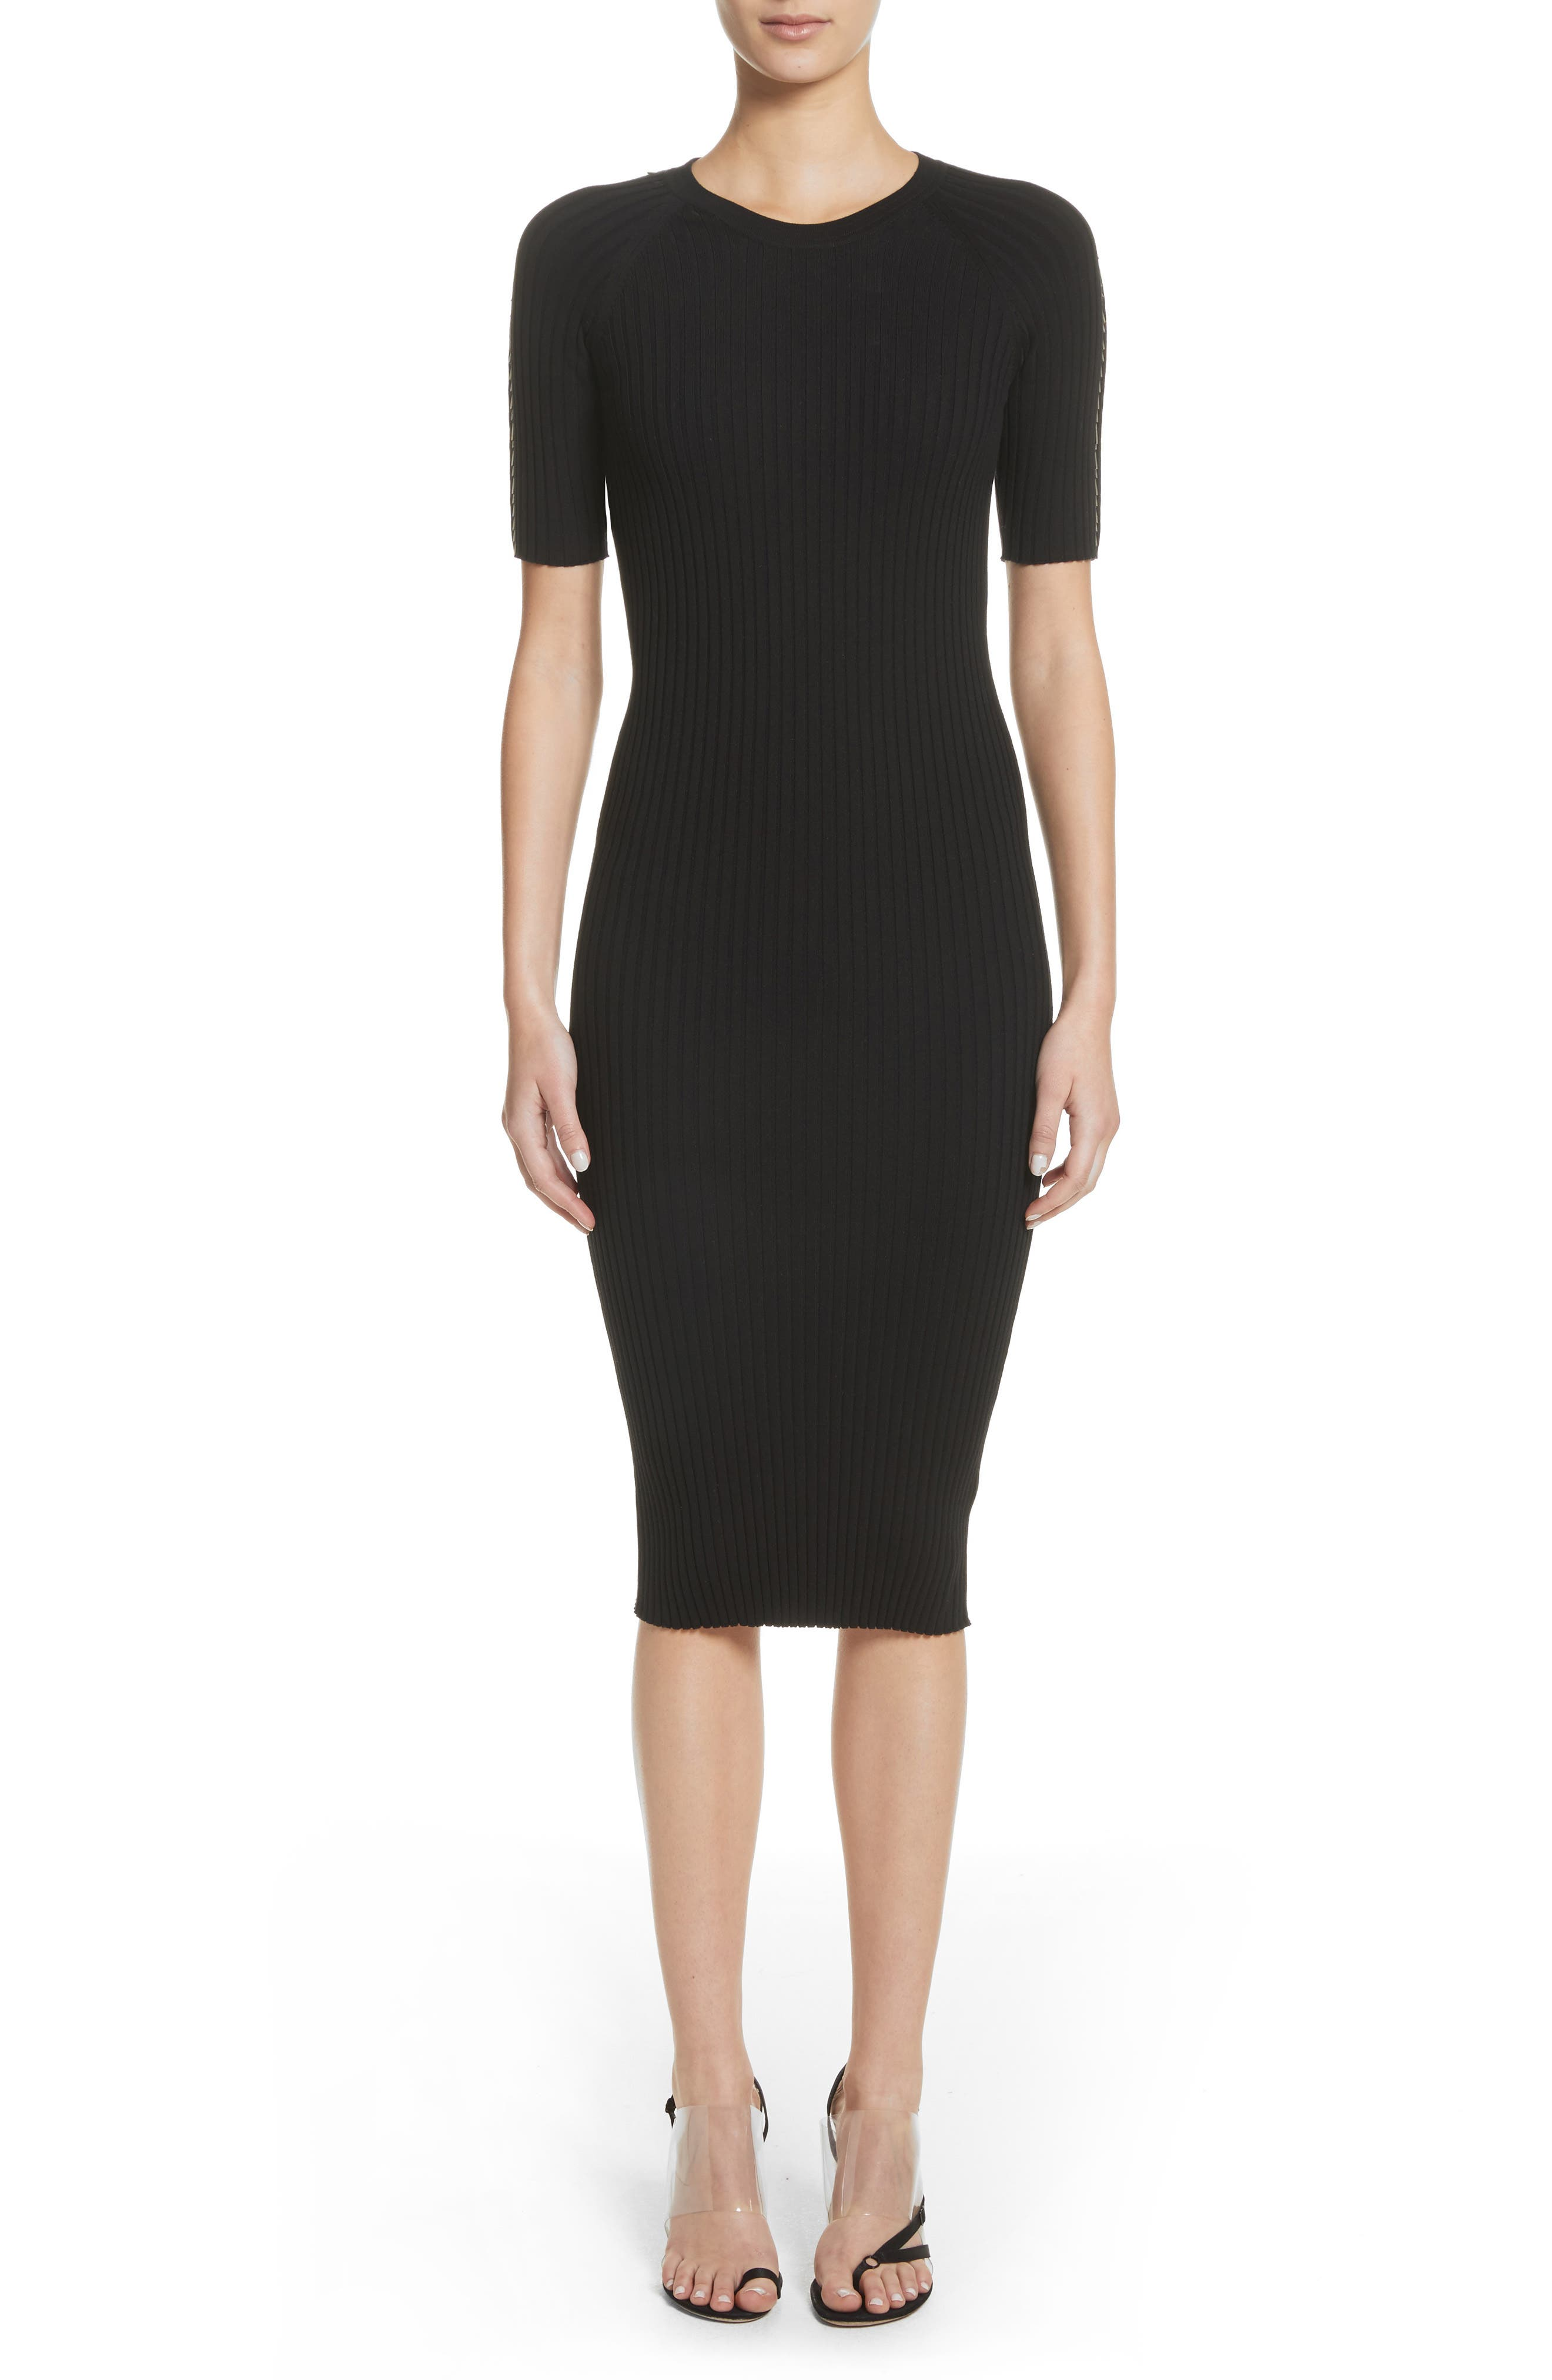 Alternate Image 1 Selected - Alexander Wang Pin Pierce Ribbed Body-Con Dress